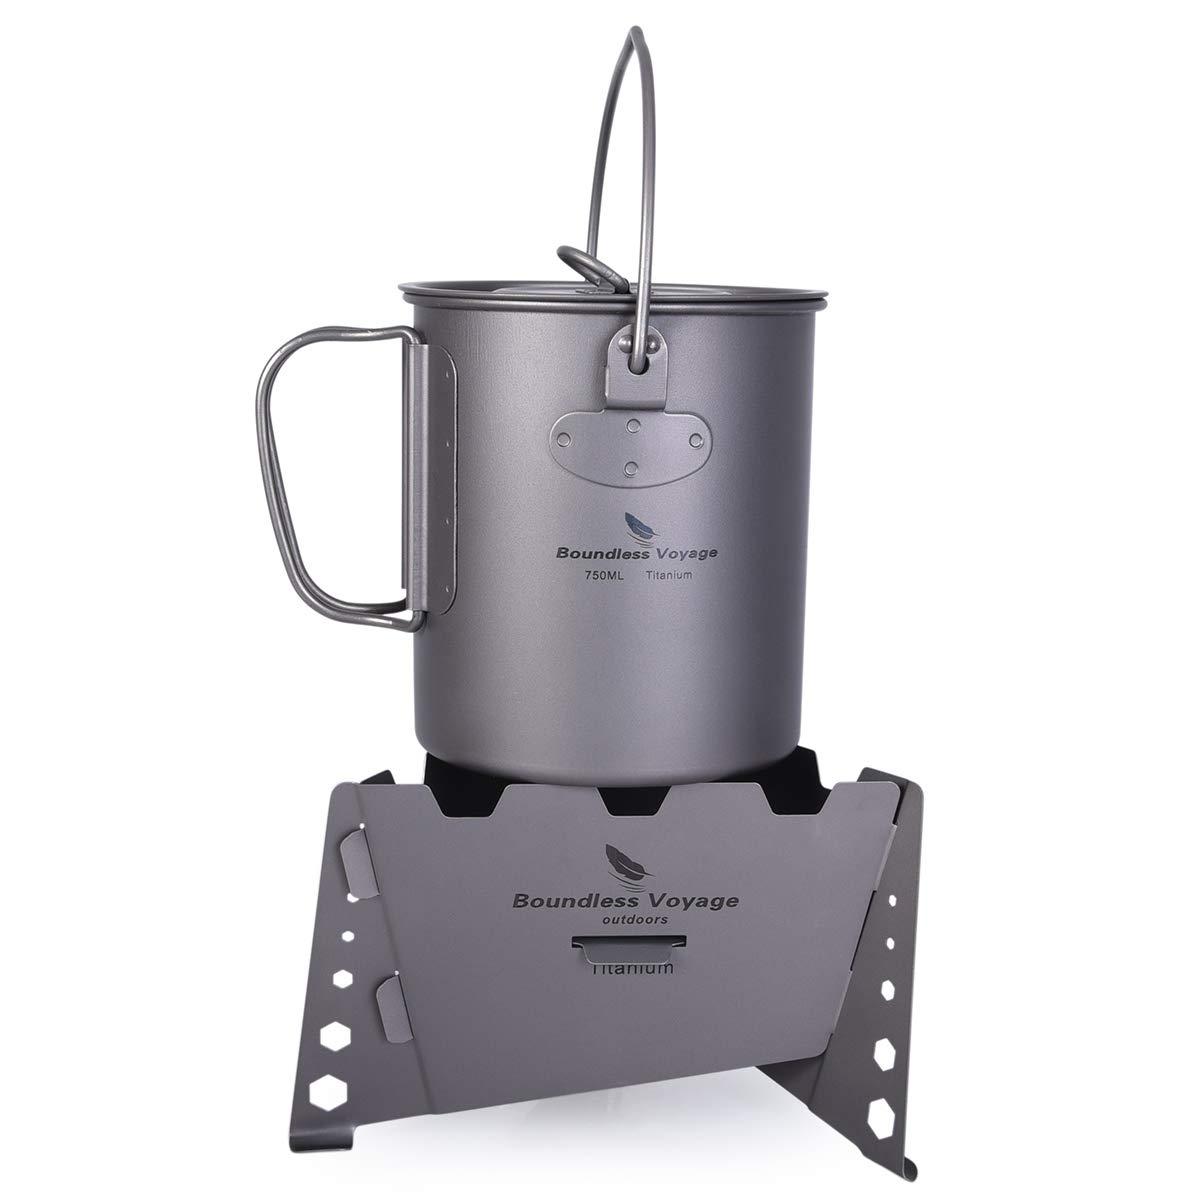 usharedo Outdoor 750ml Titanium Pot with Lid Folding Handle Camping Hiking Picnic Ultralight Portable Water Bottle Cup Mug Spork Set by usharedo